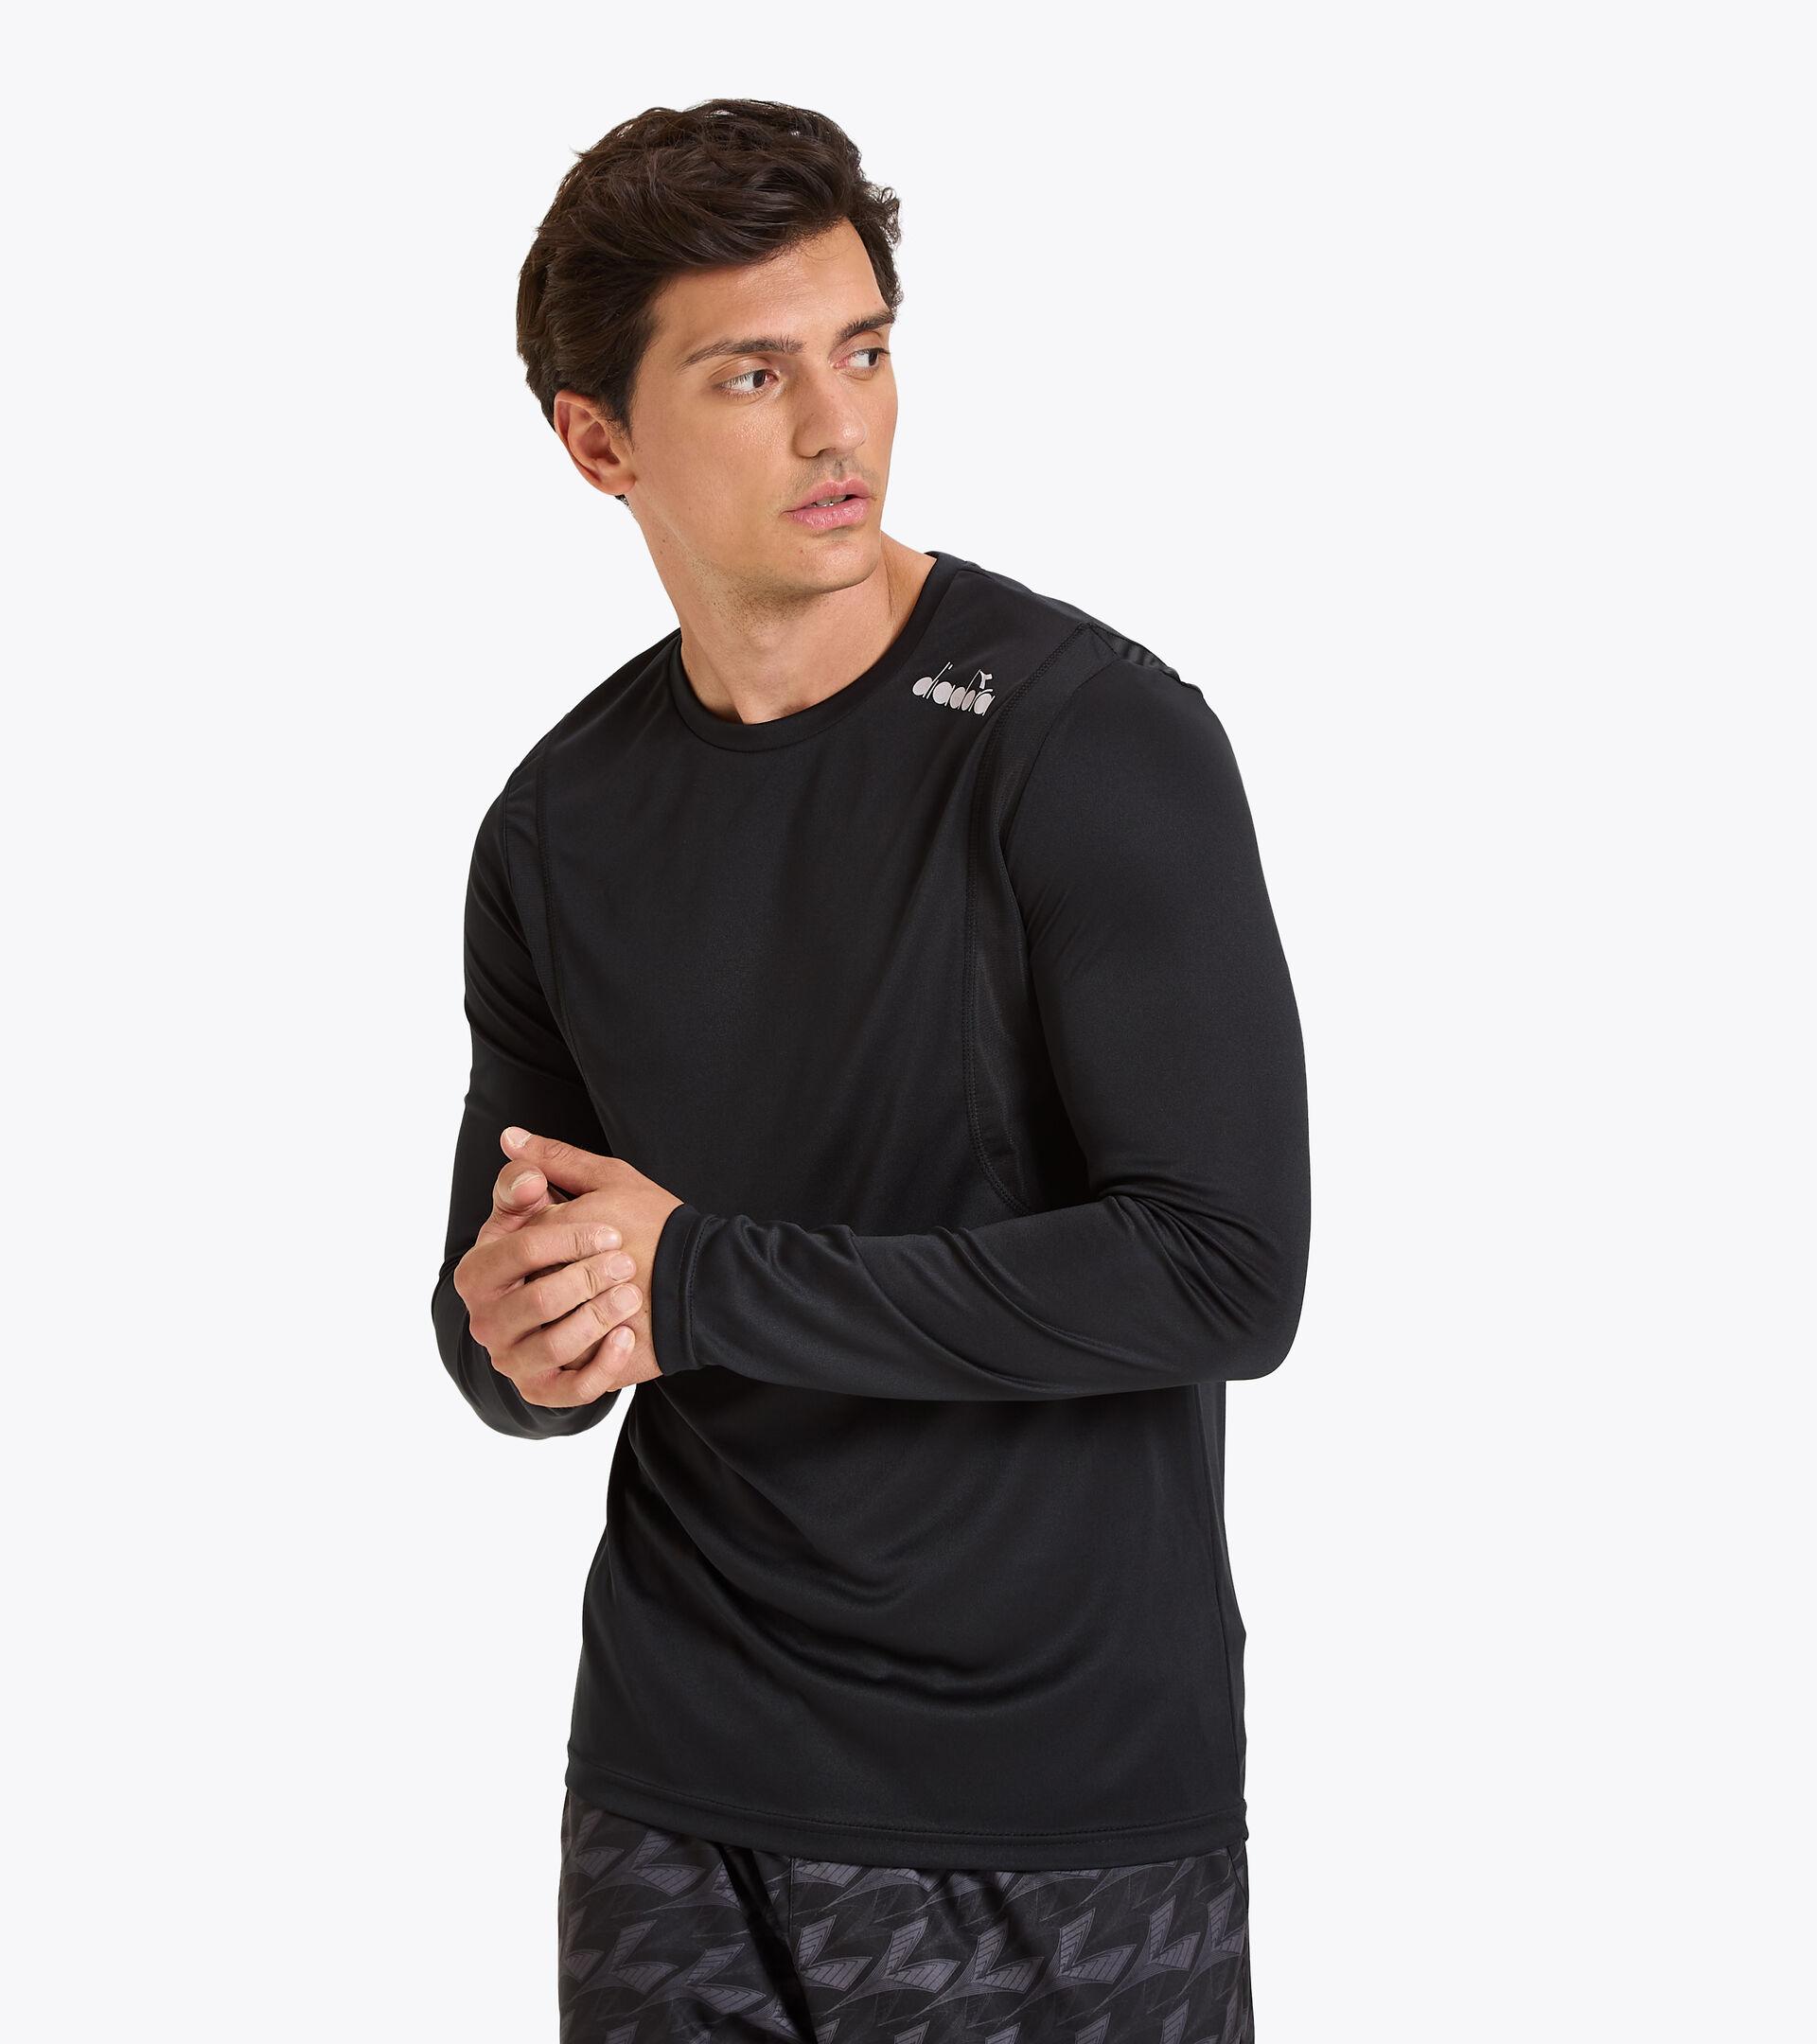 Camiseta para correr - Hombre LS CORE TEE NEGRO - Diadora